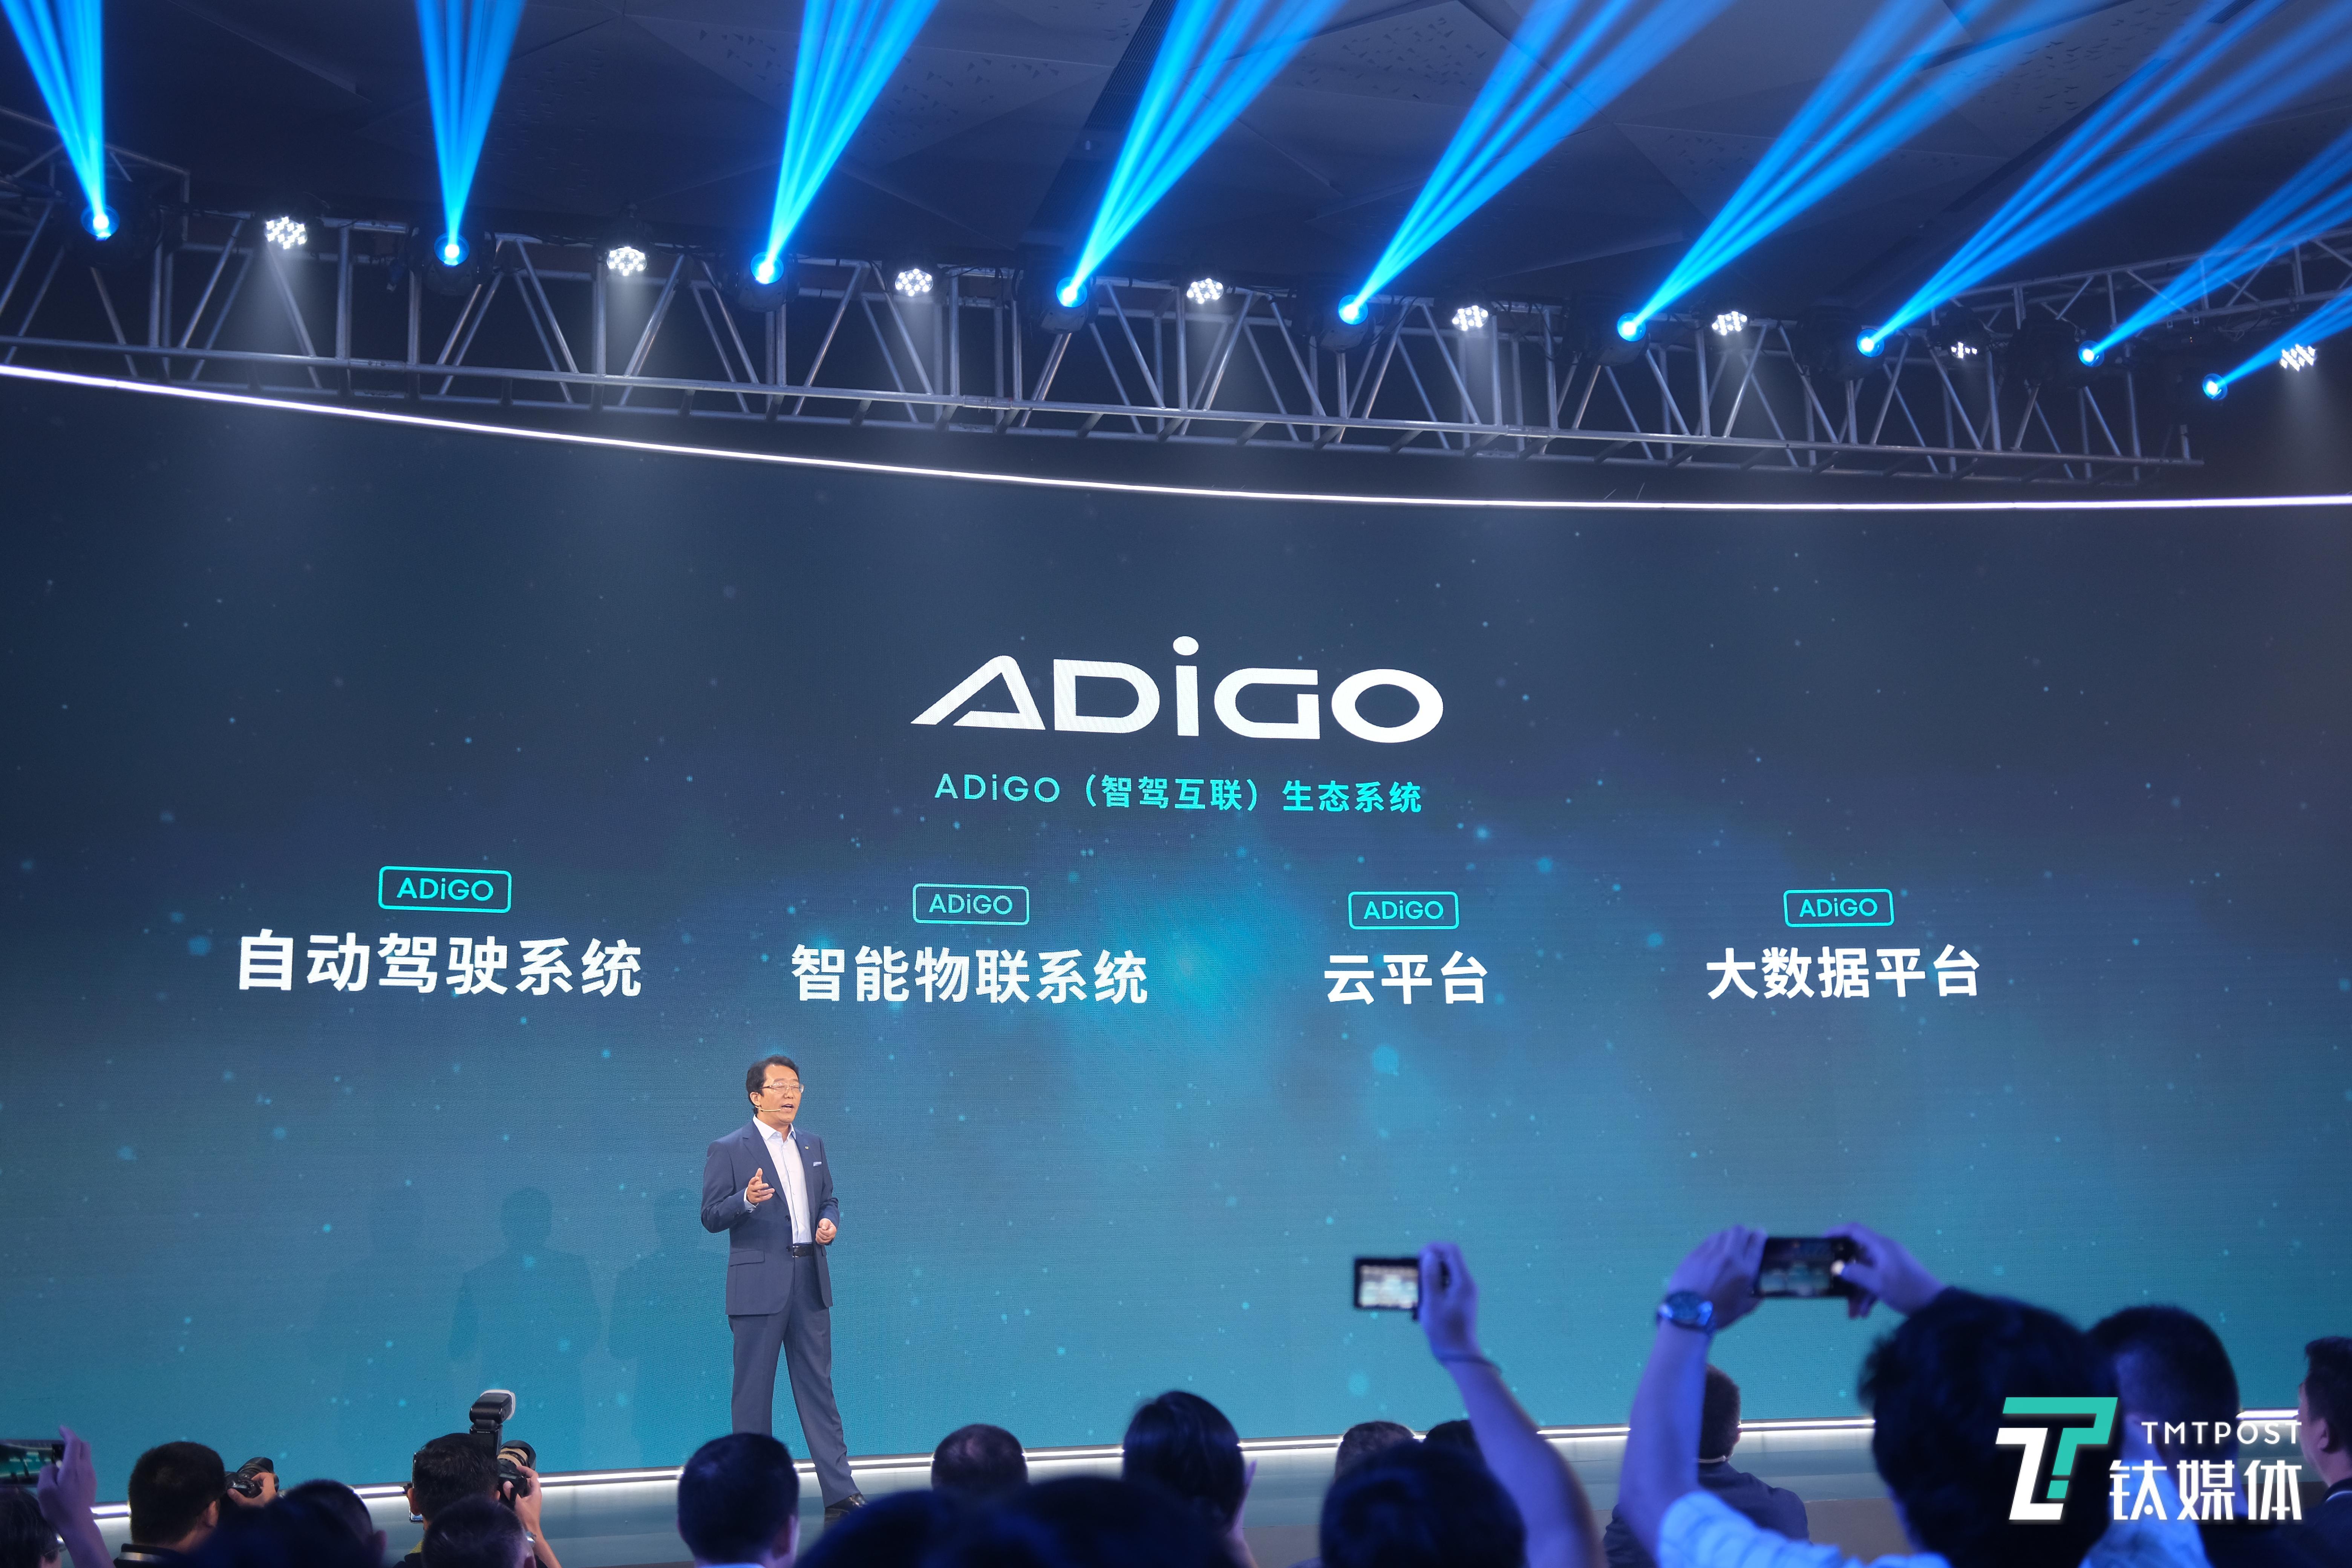 ADiGO智驾互联生态系统